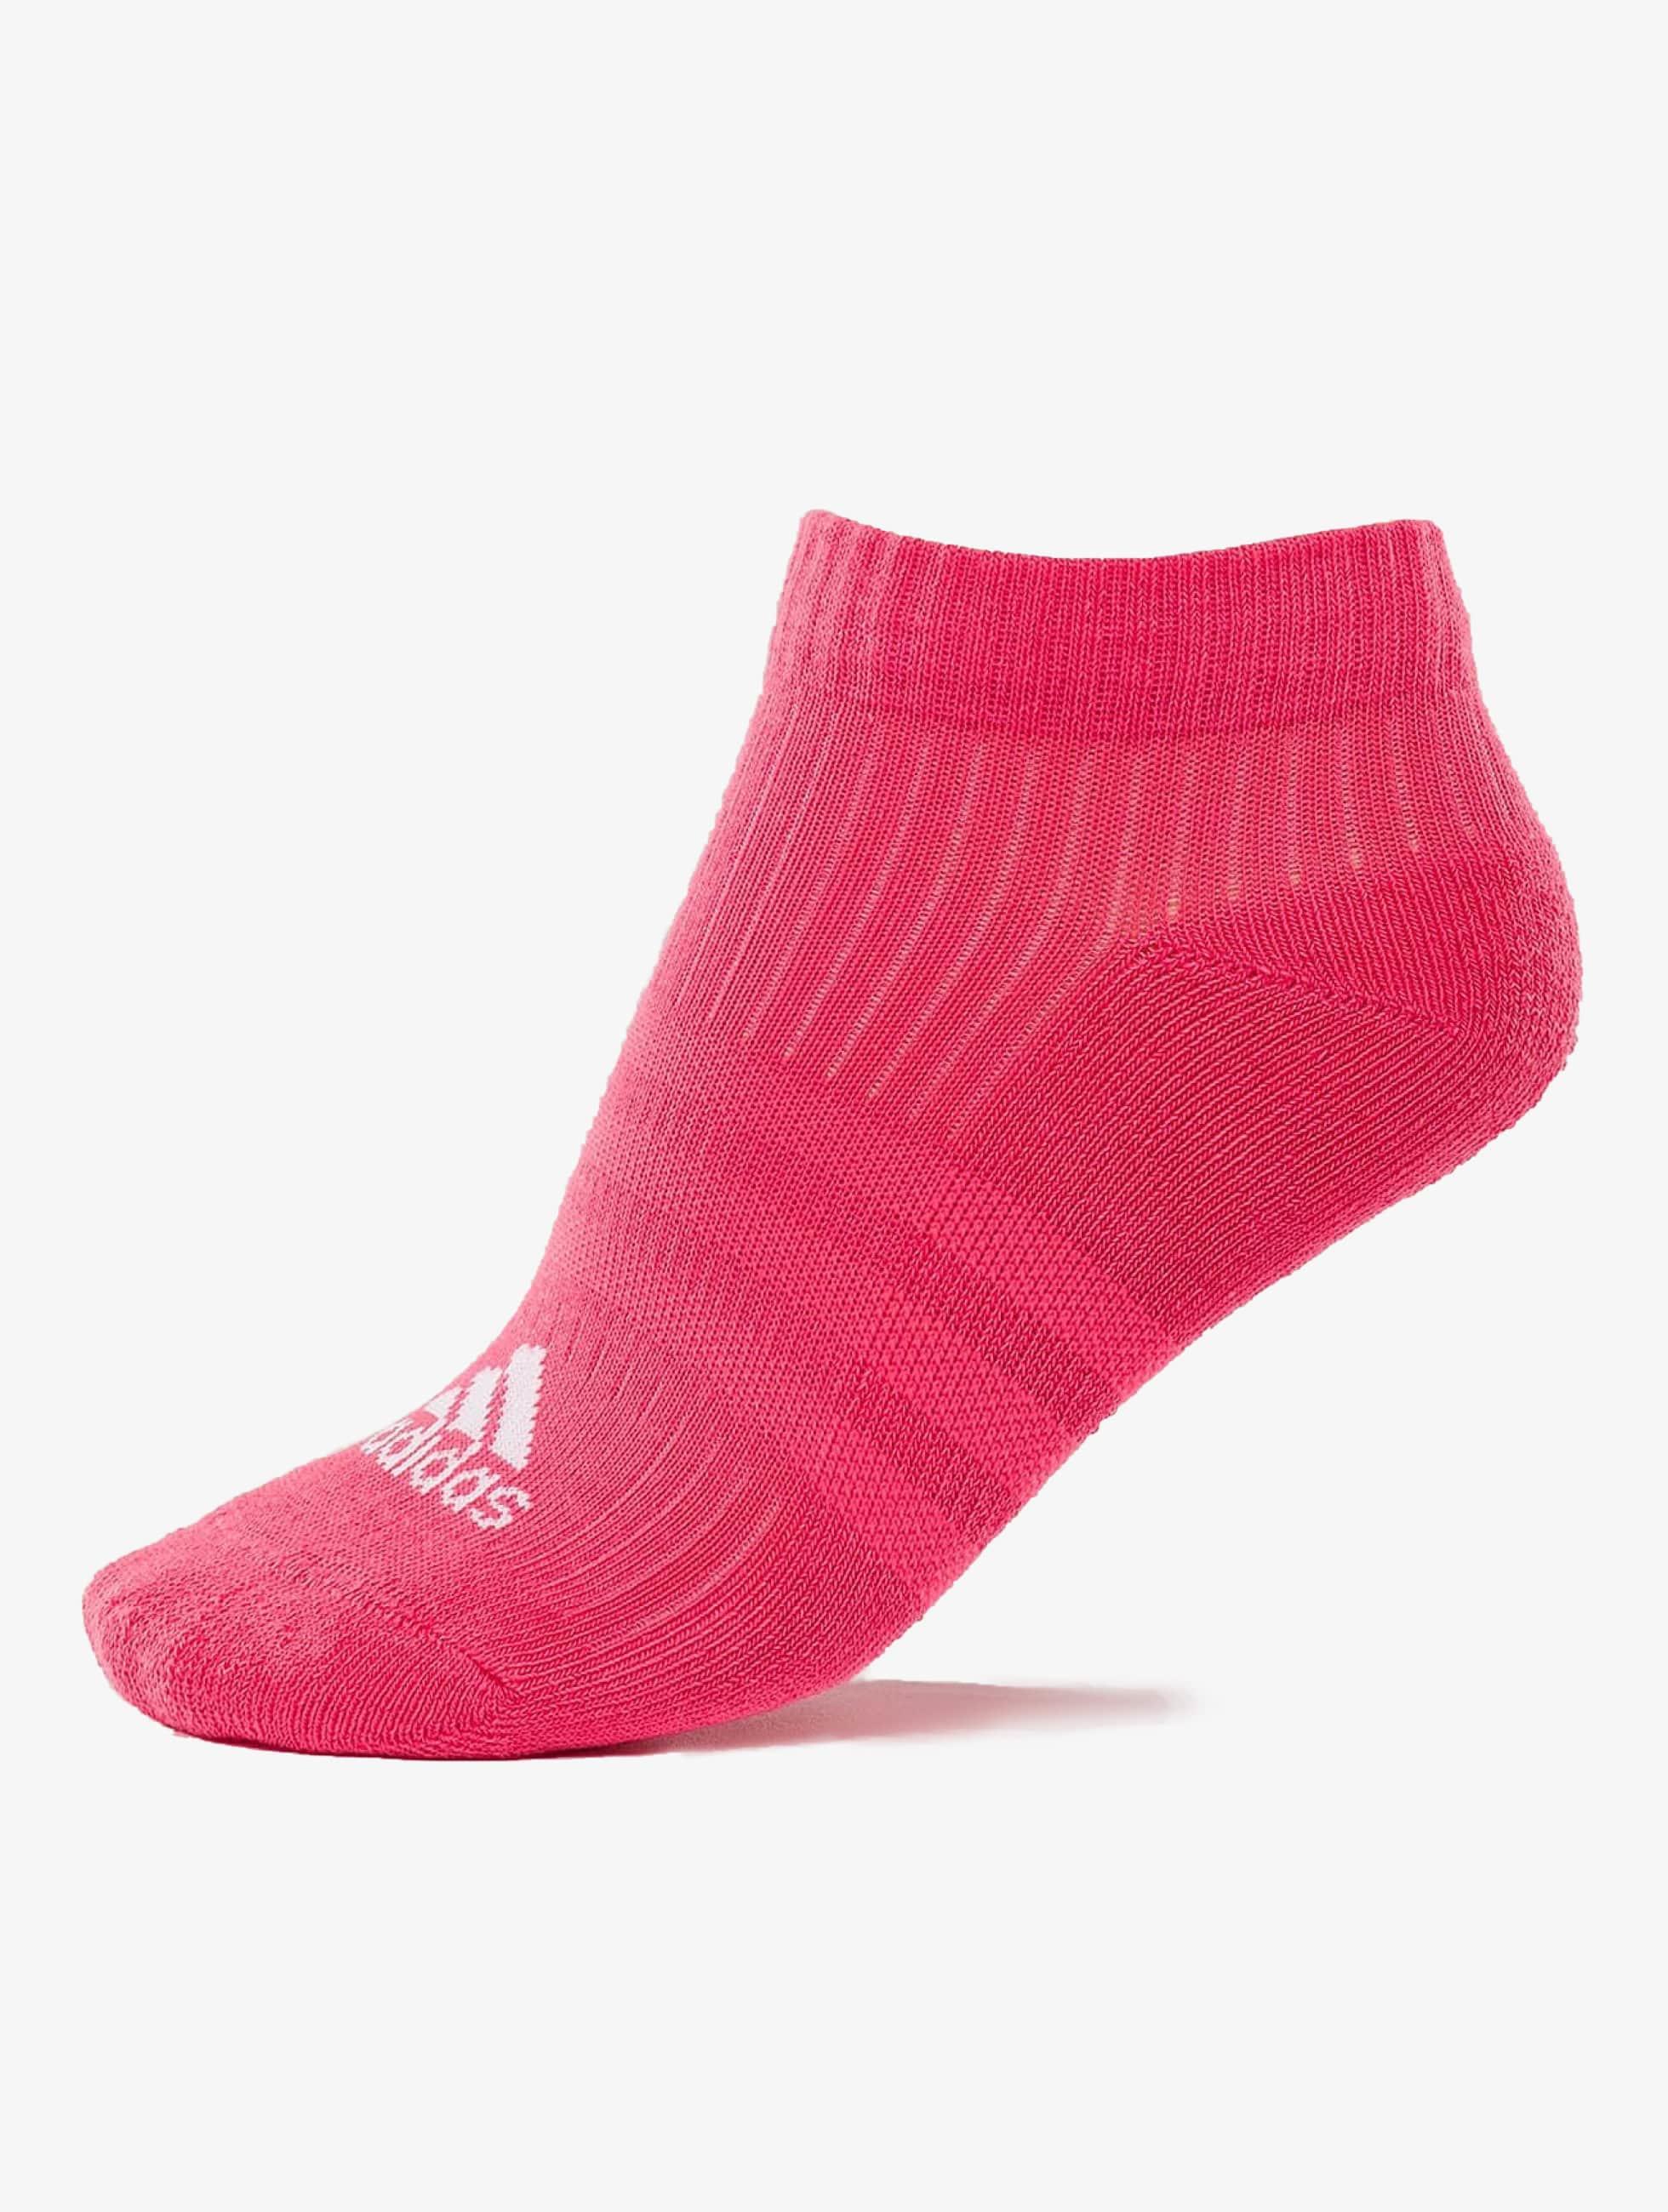 adidas originals Skarpetki 3-Stripes Per n-s HS 3-Pairs pink